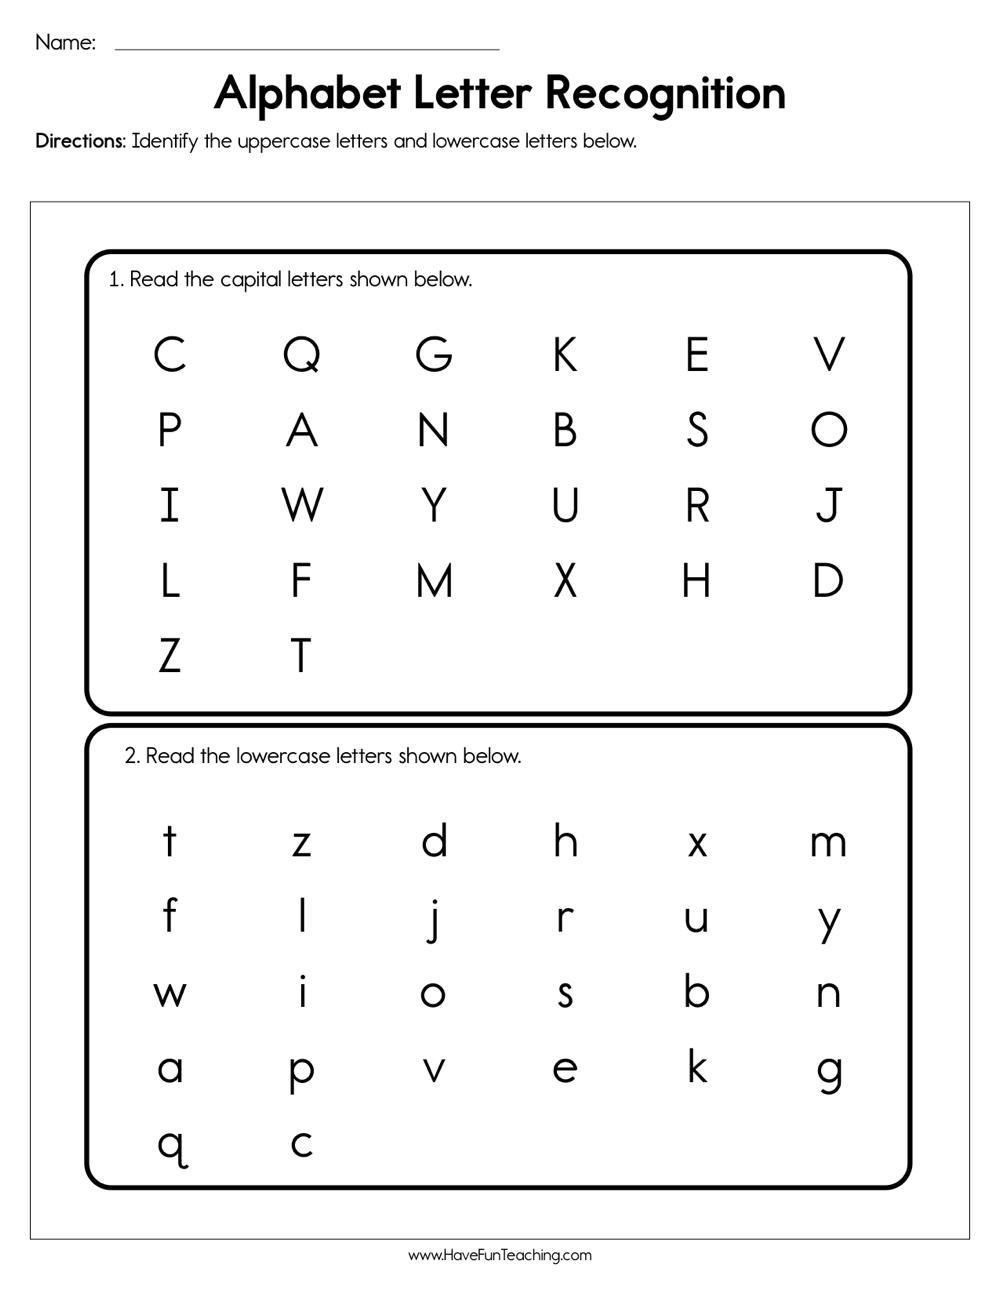 Alphabet Letter Recognition Assessment regarding Alphabet Recognition Worksheets